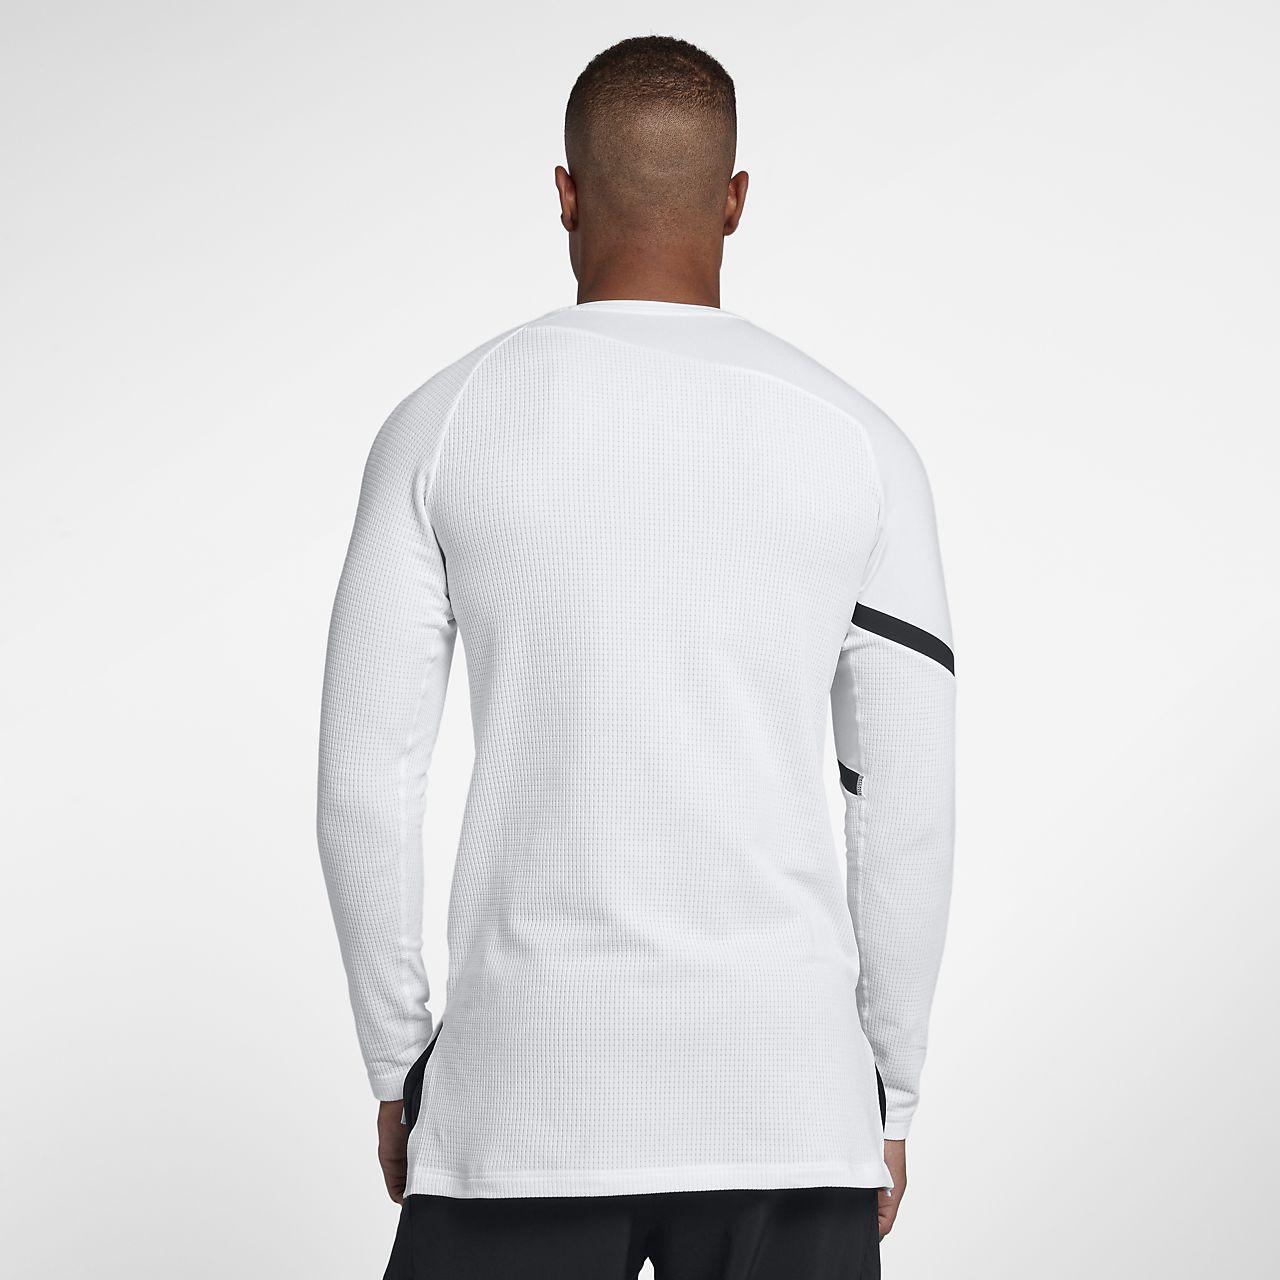 5cd41149 Nike Pro Modern Men's Long-Sleeve Top. Nike.com CA